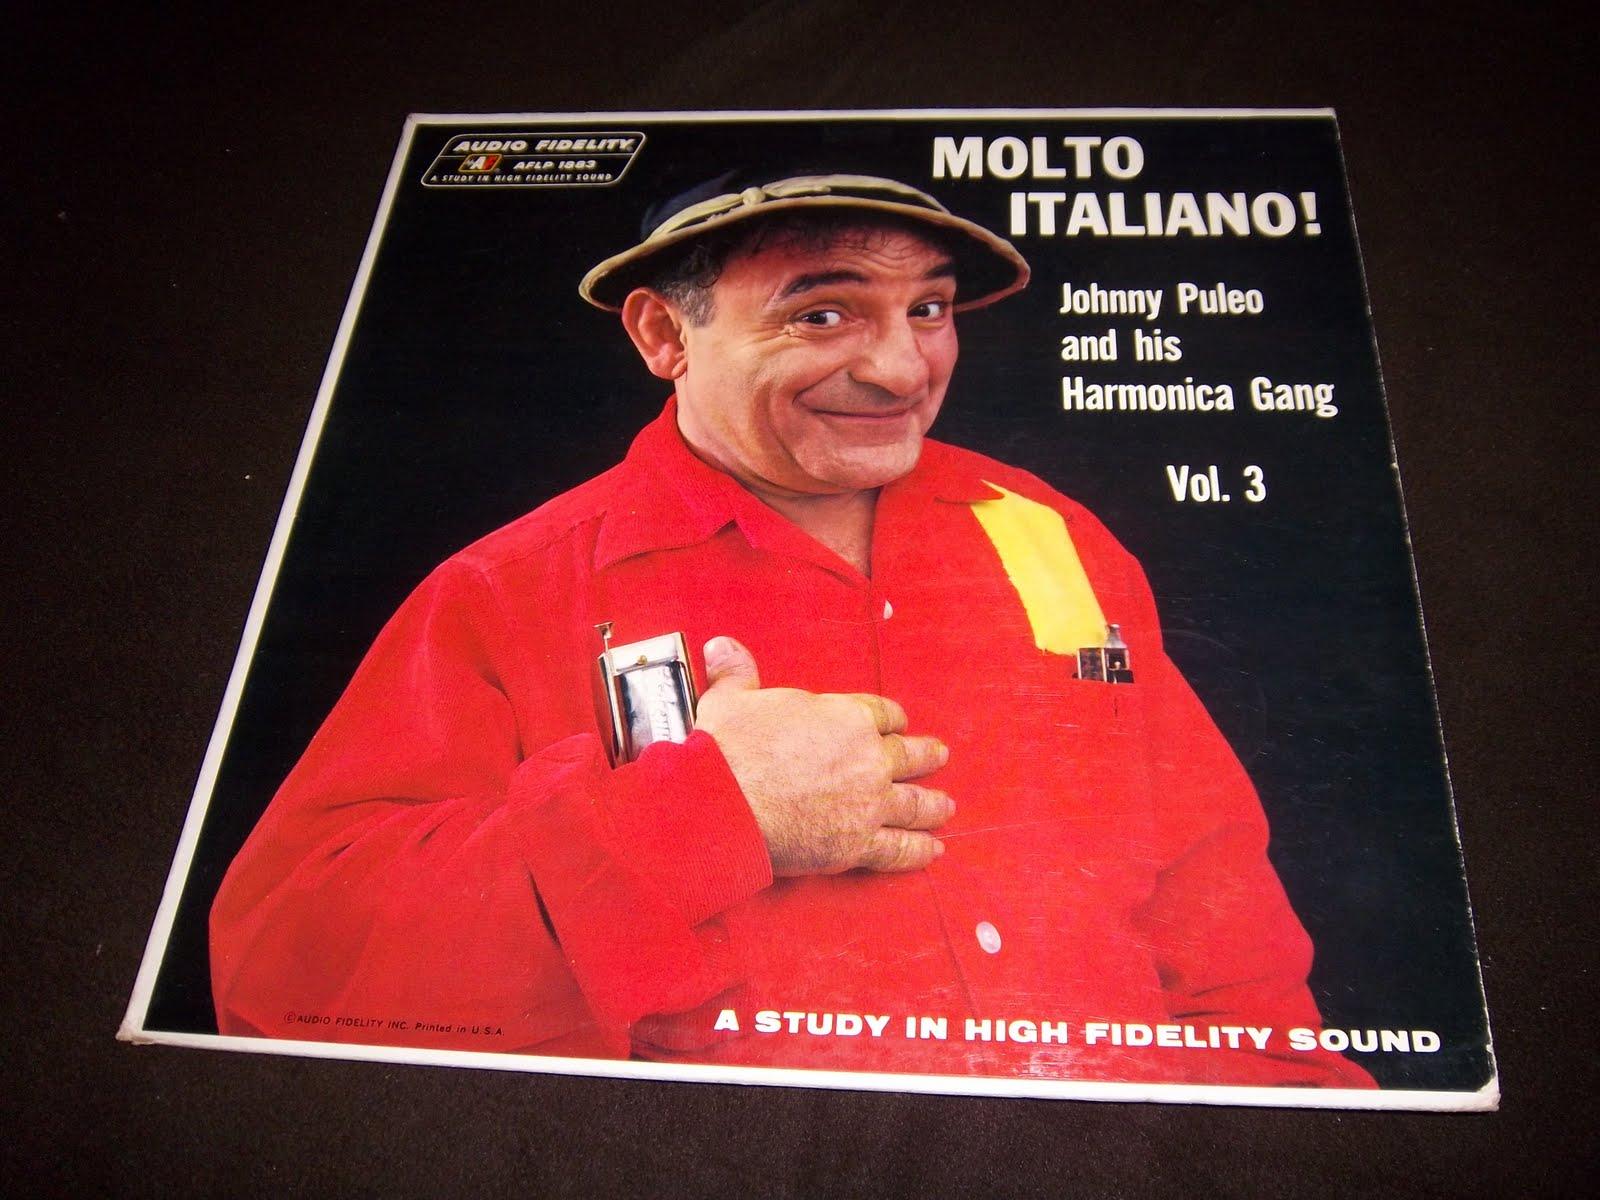 Hear Wax Johnny Puleo And His Harmonica Gang Molto